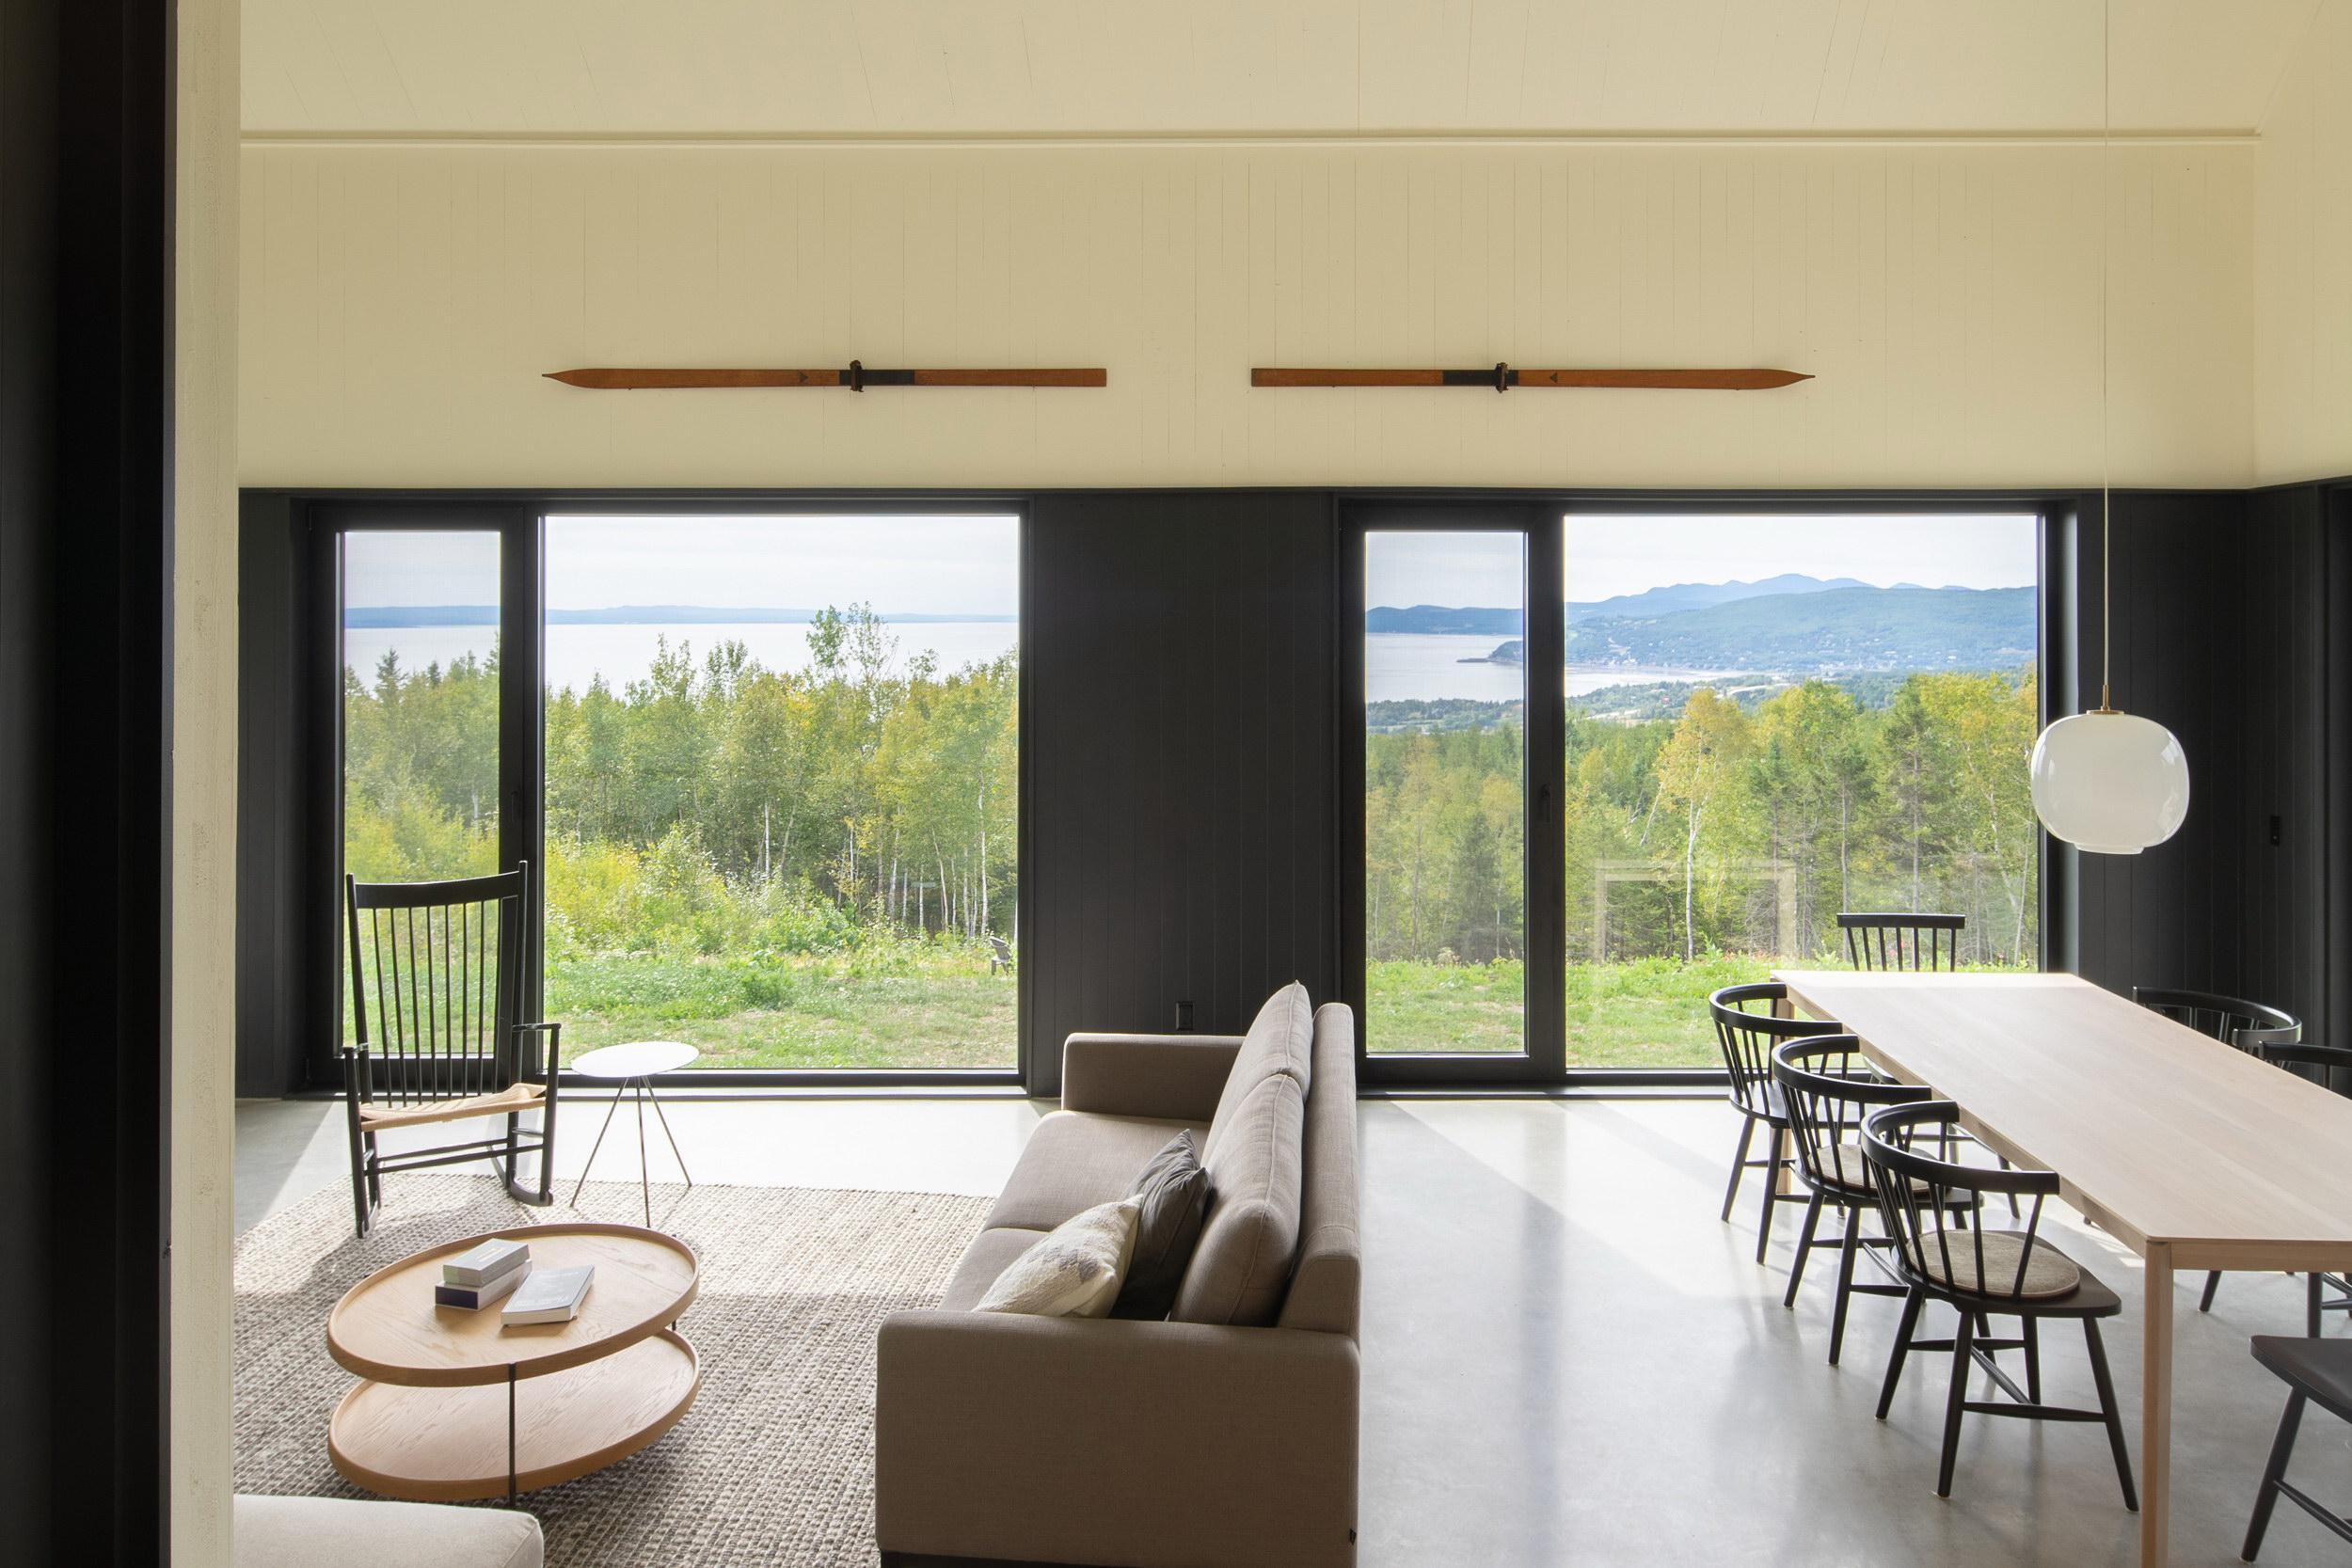 Les Rorquals by Alain Carle Architecte